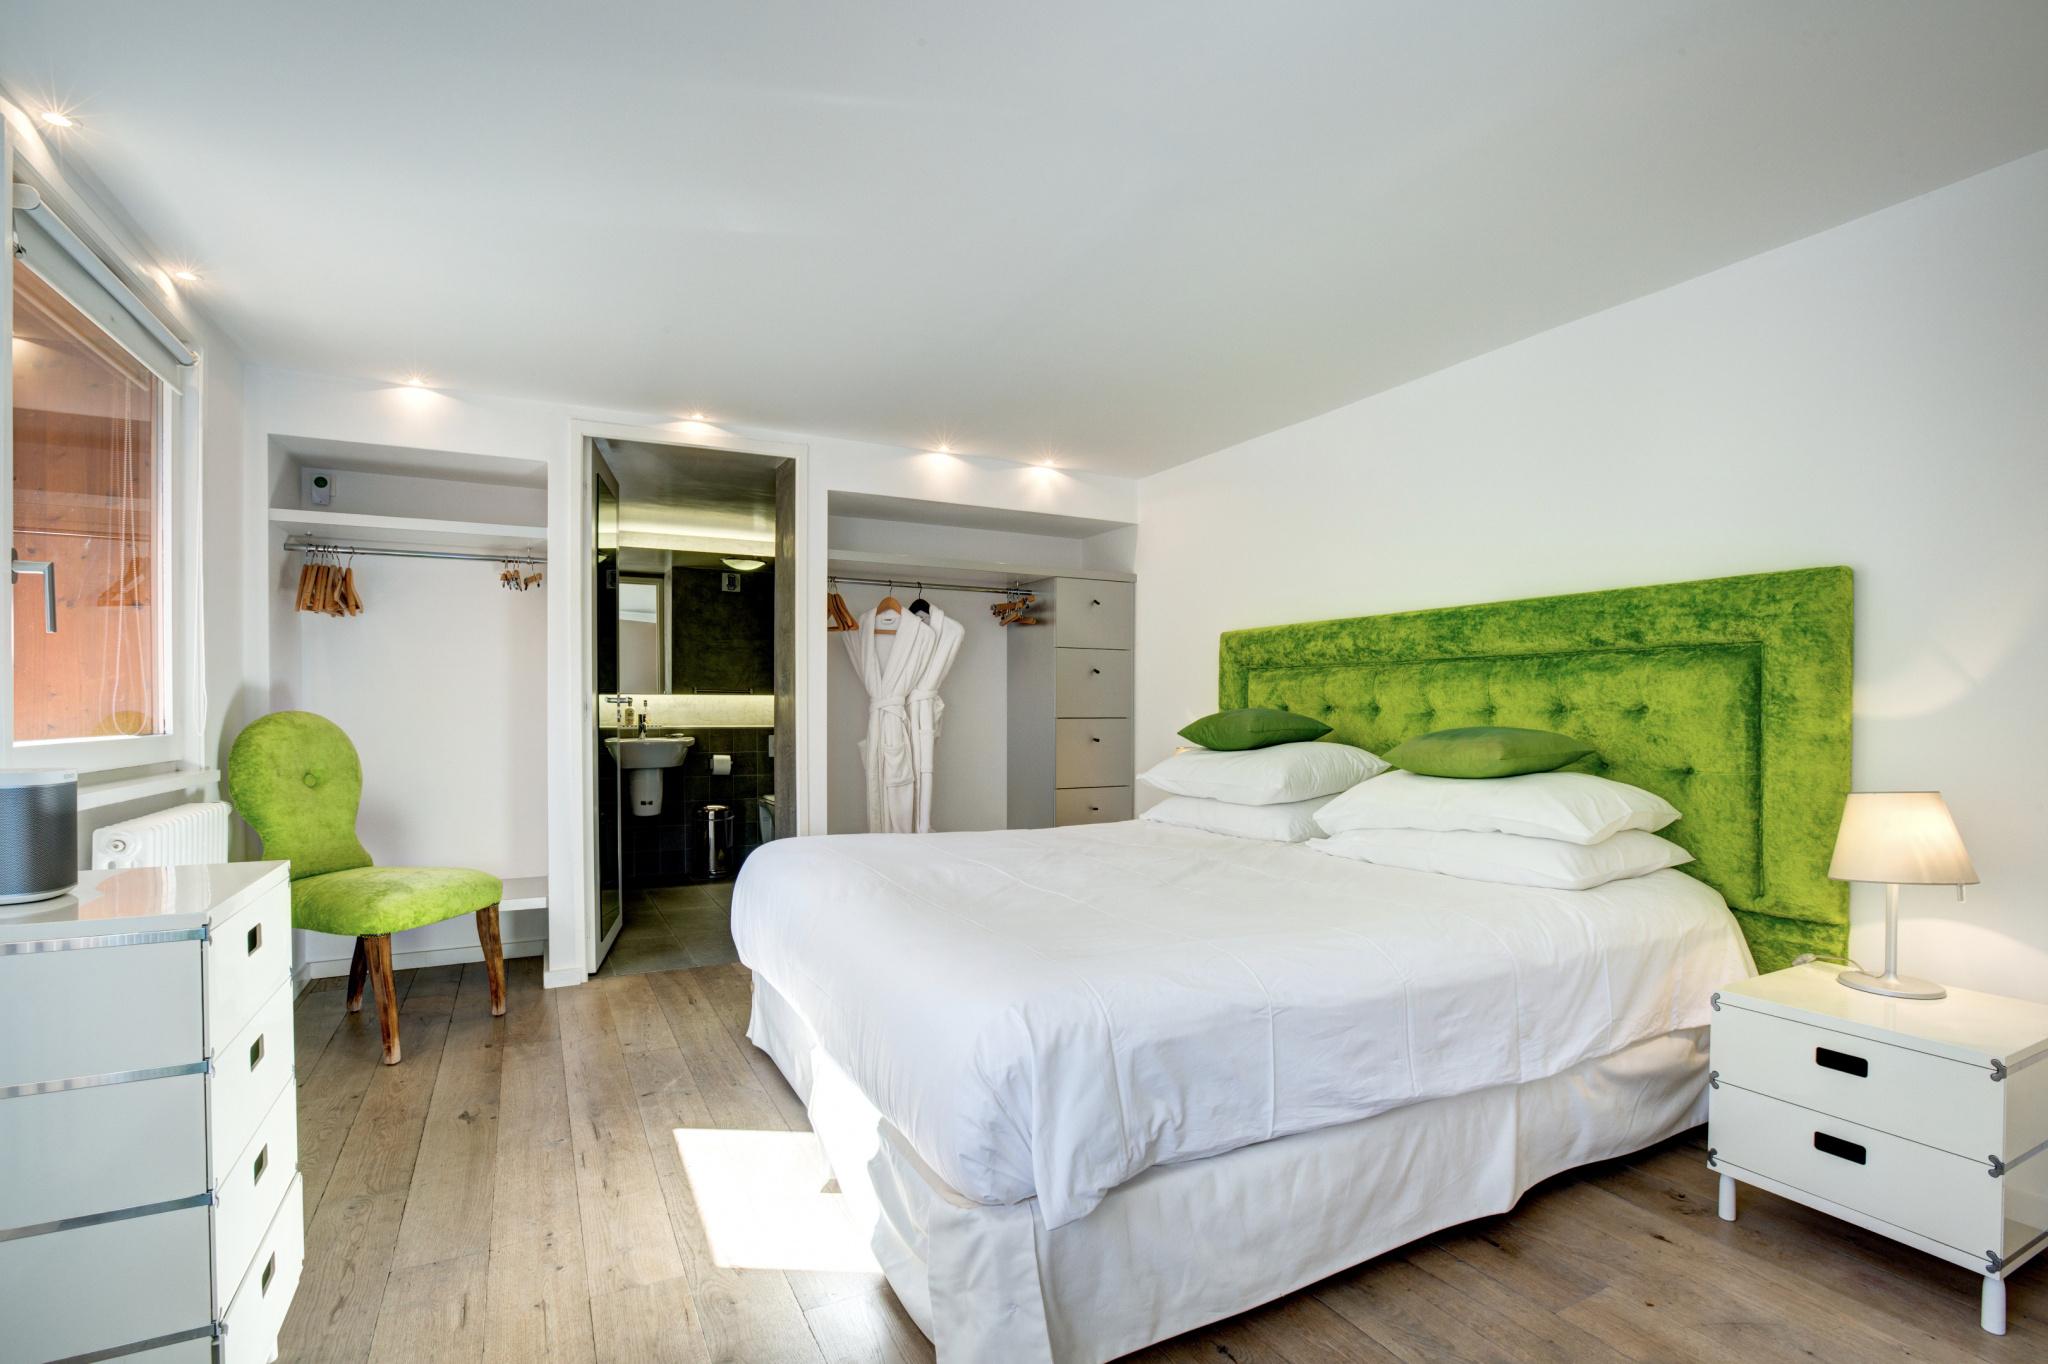 OUTSTANDING 6 BED LUXURY CHALET, CHAMONIX LES NANTS